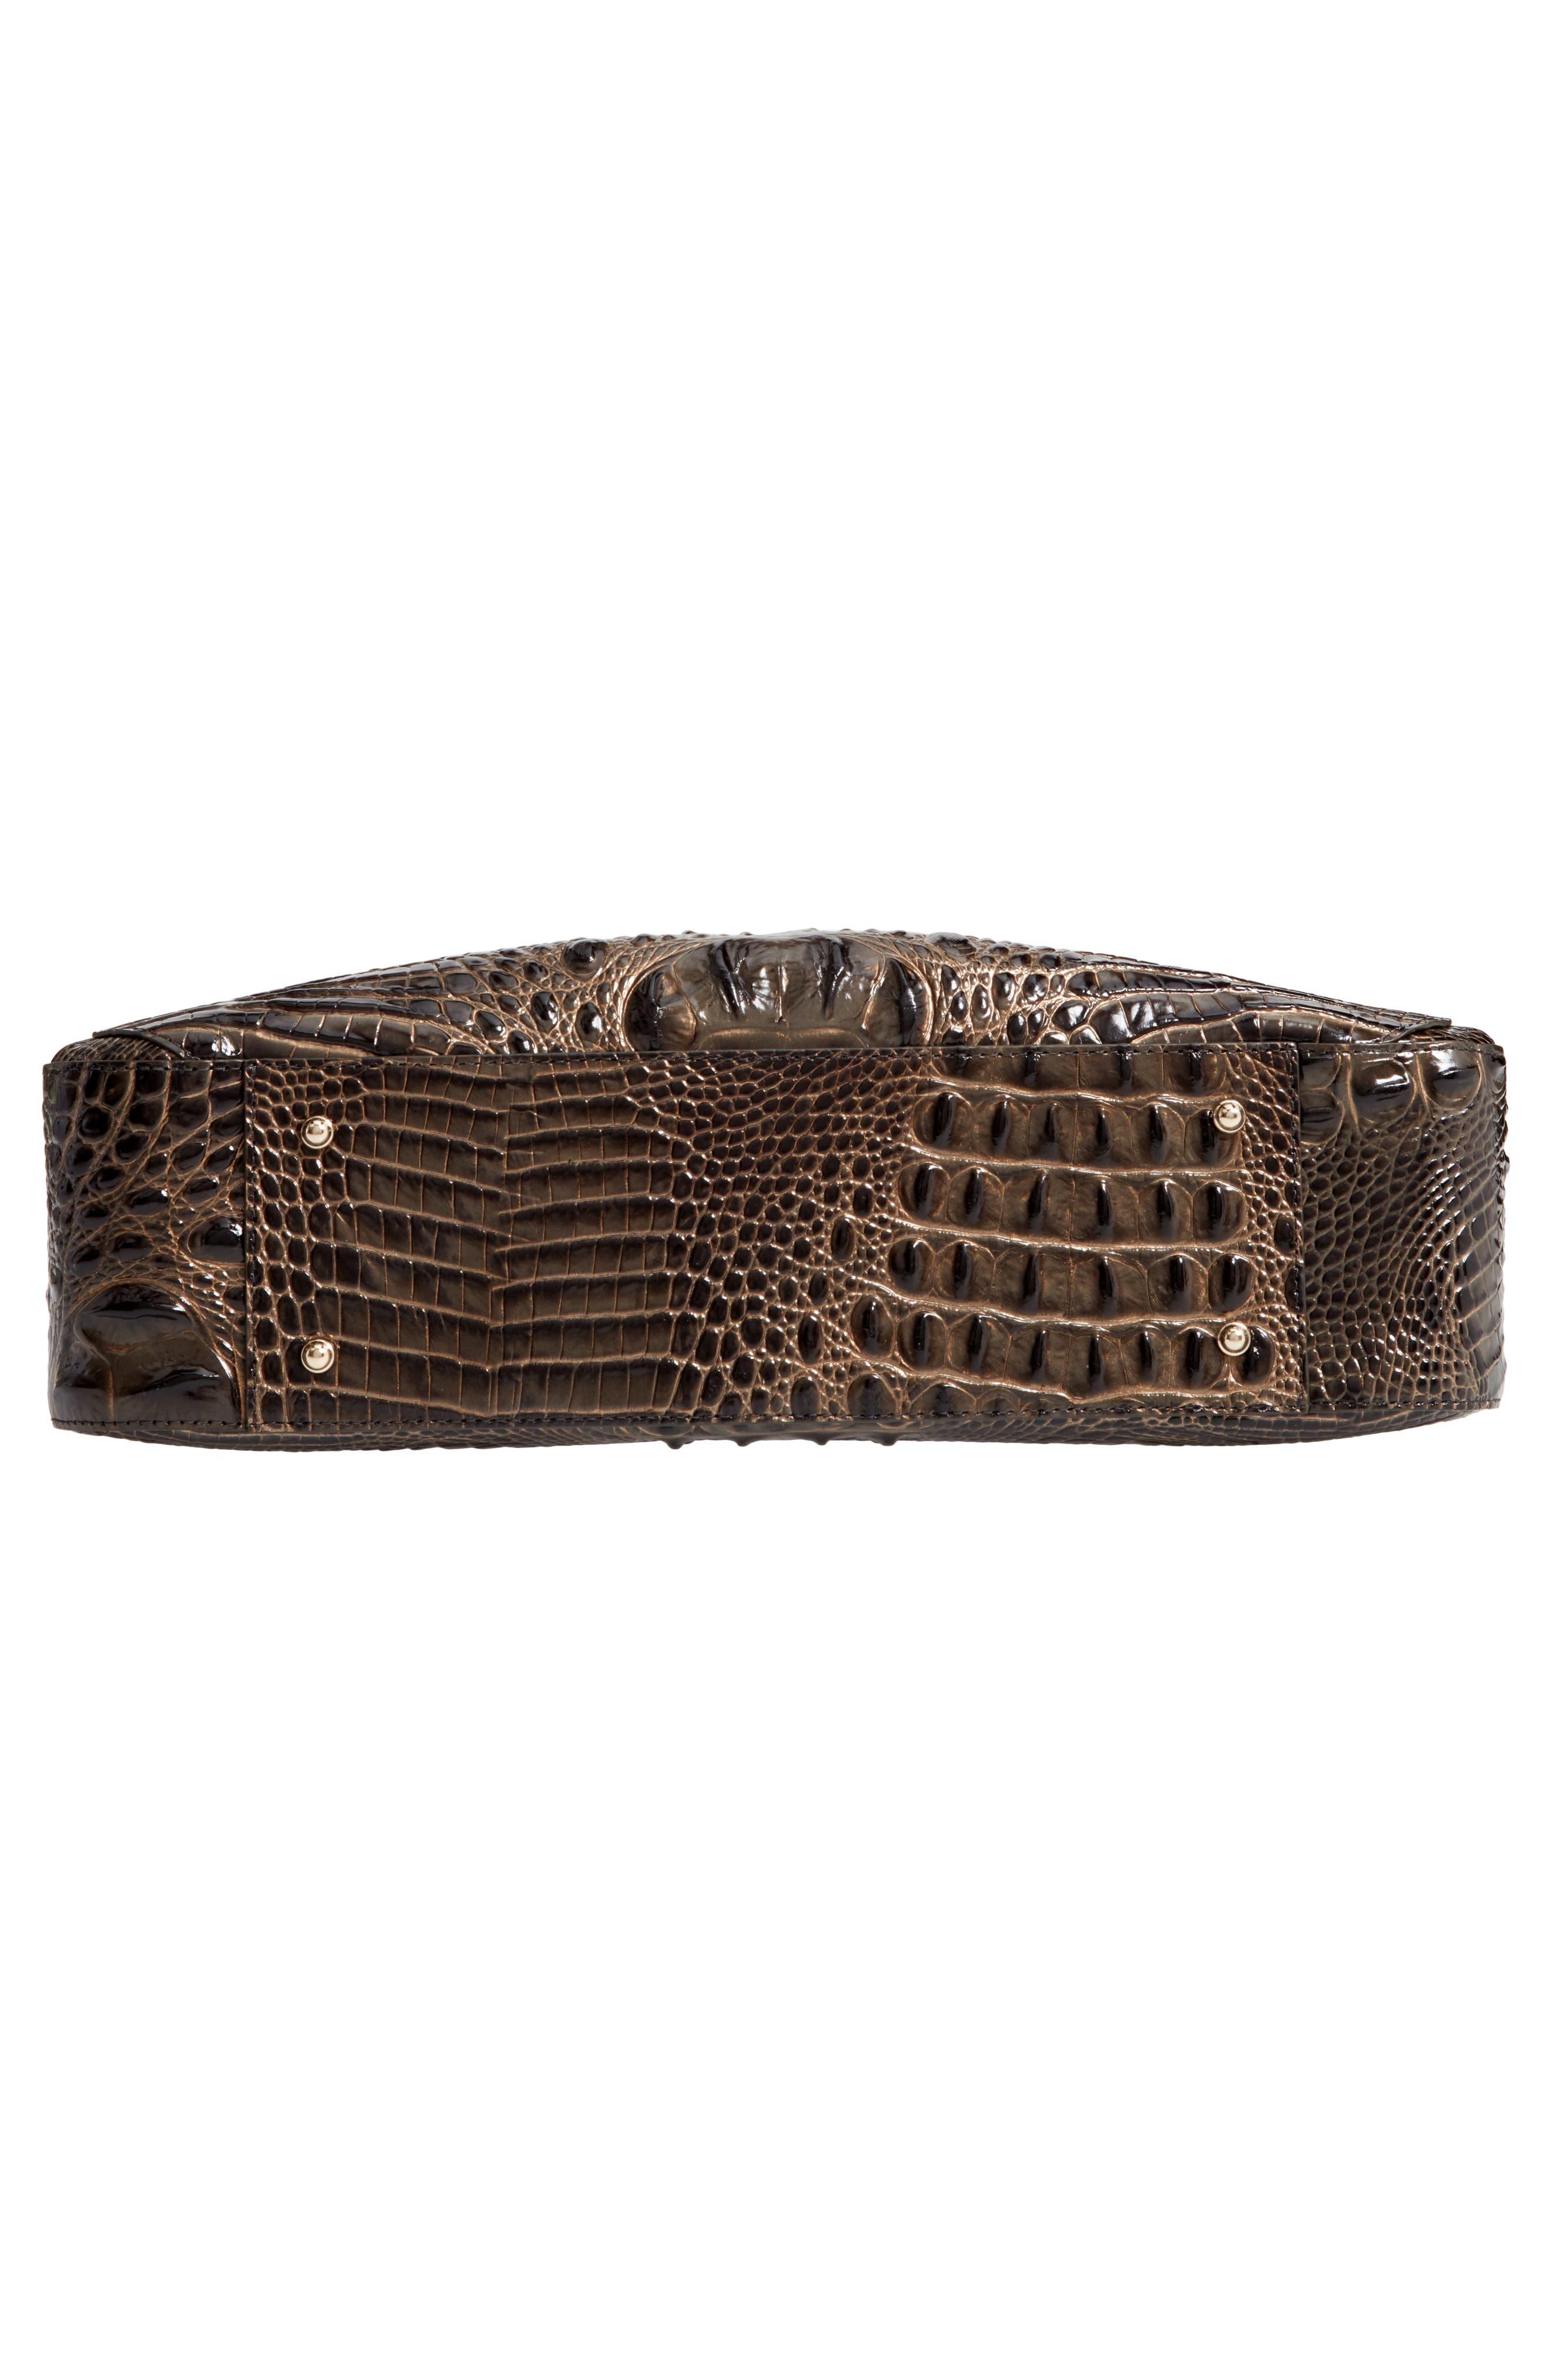 Melbourne - Adina Croc Embossed Leather Satchel,                             Alternate thumbnail 6, color,                             GRAPHITE